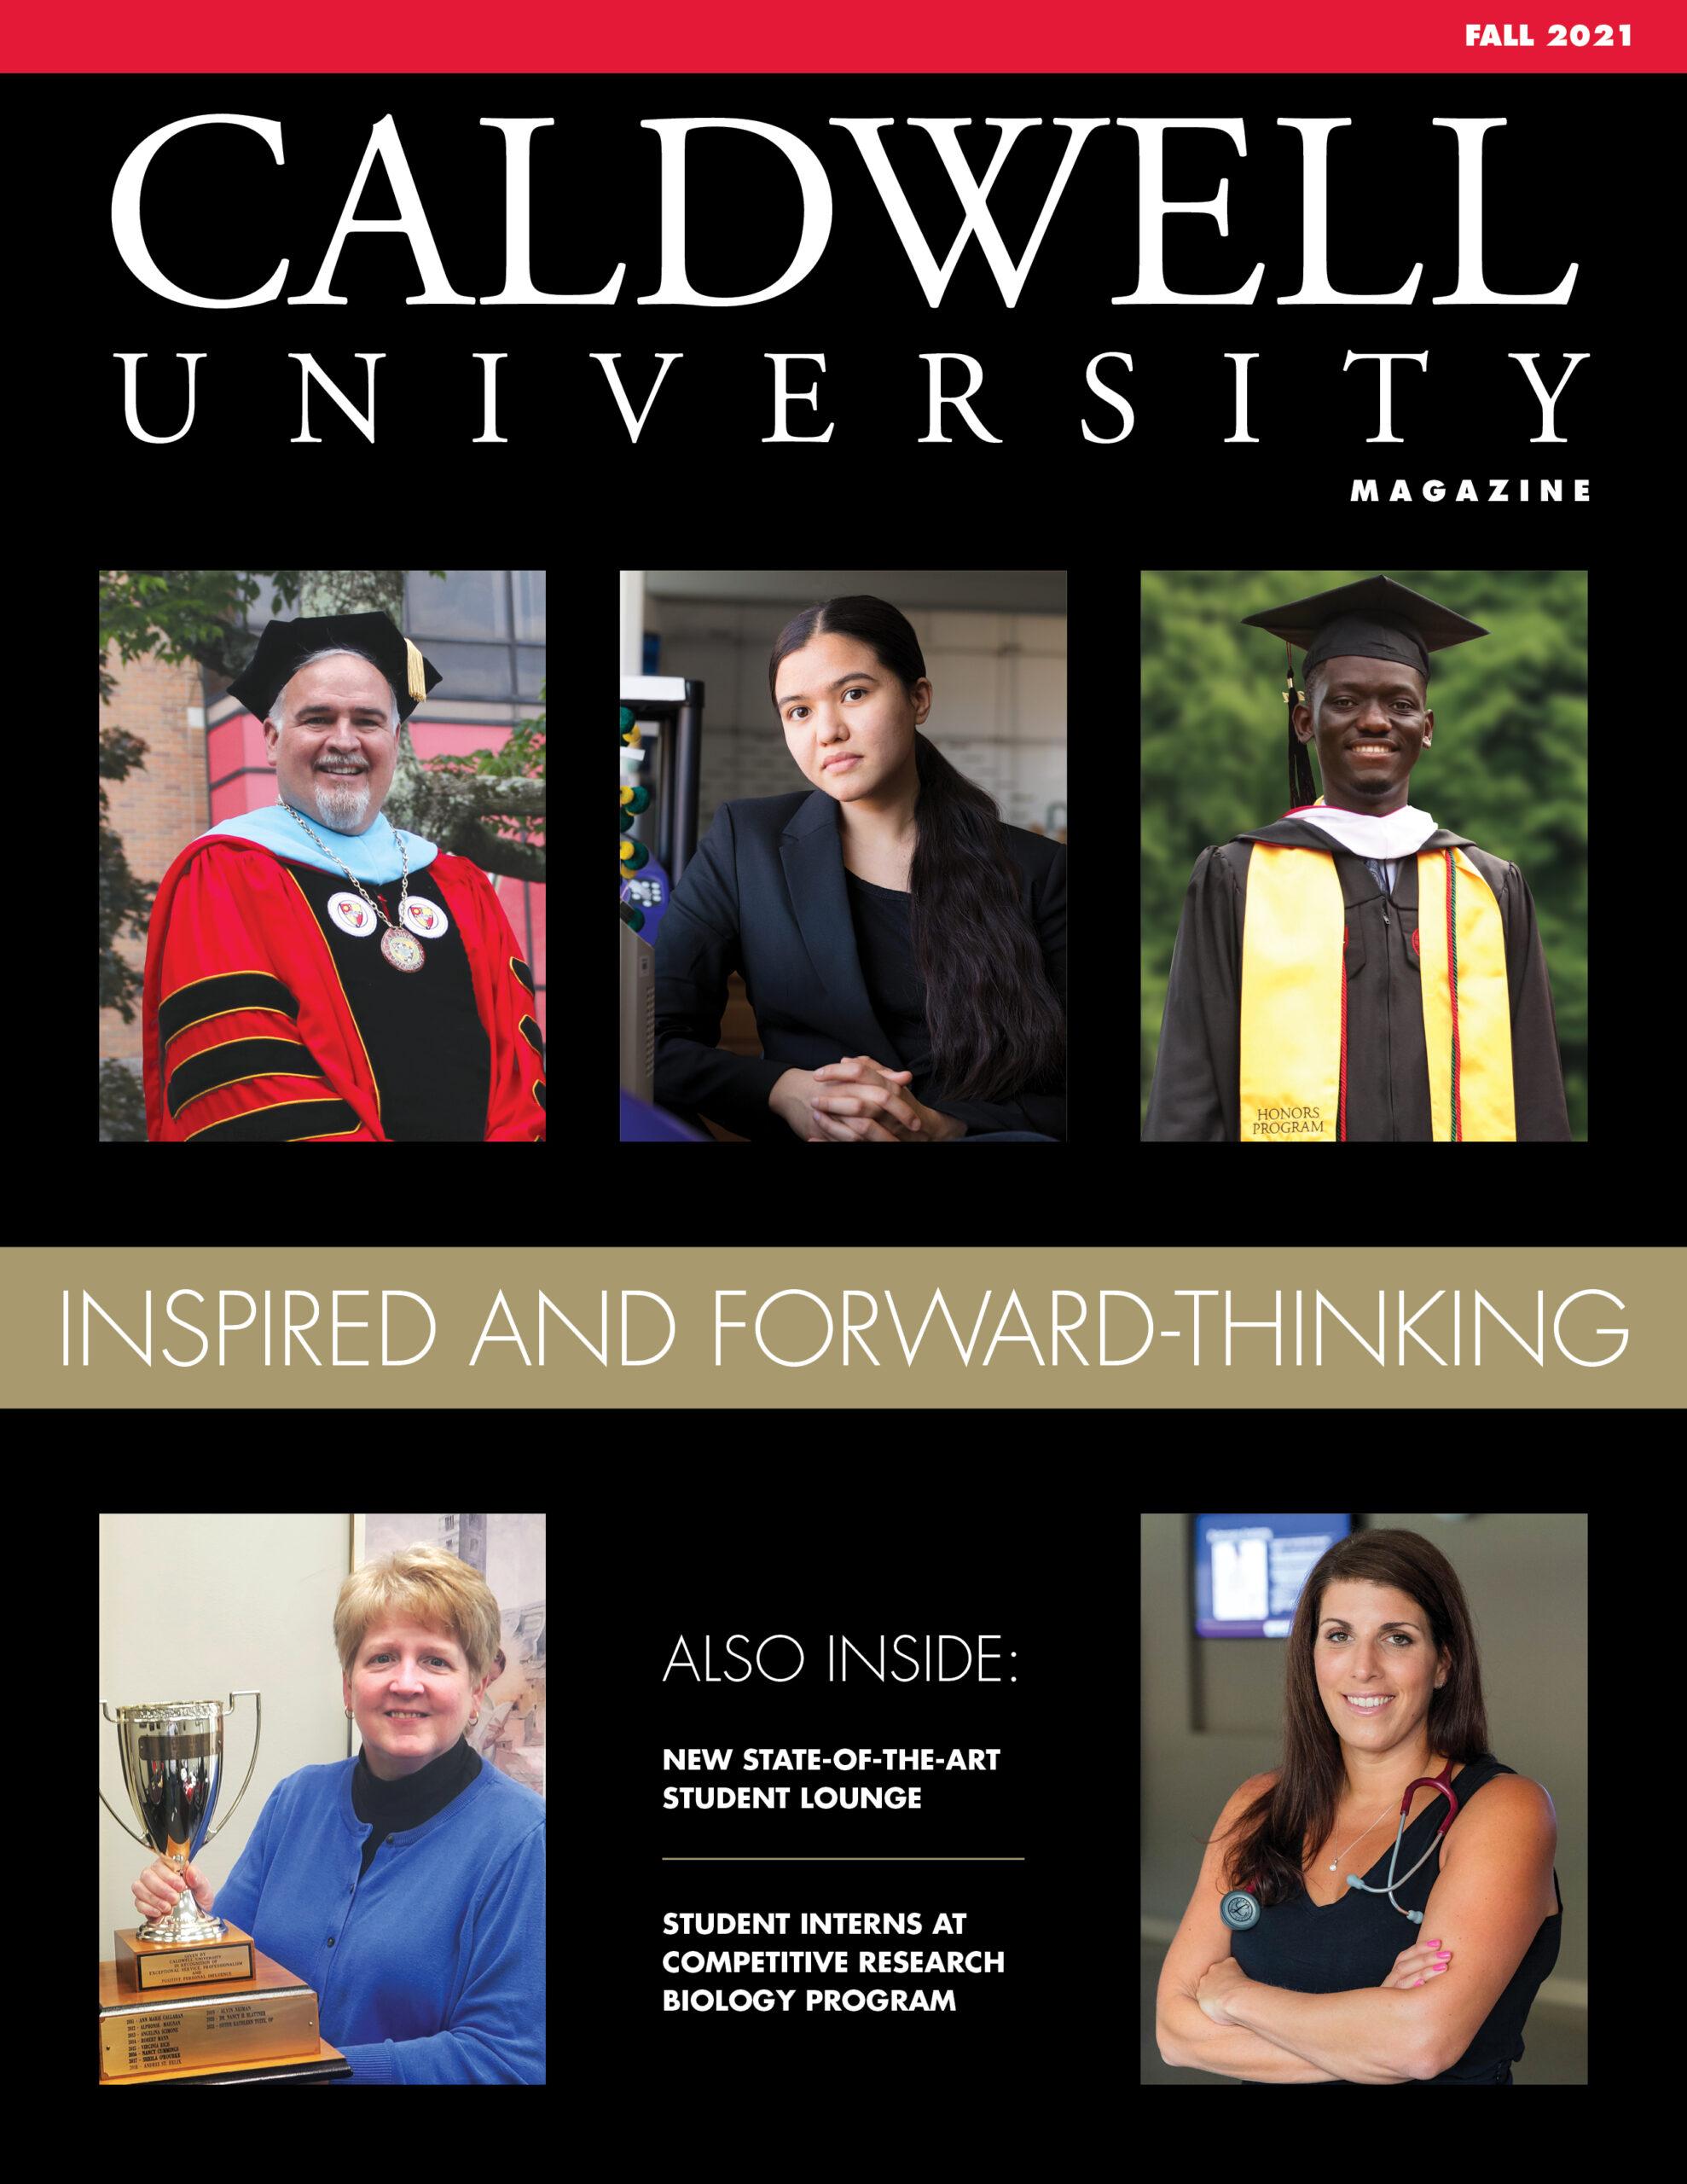 Fall 2021 Magazine Cover